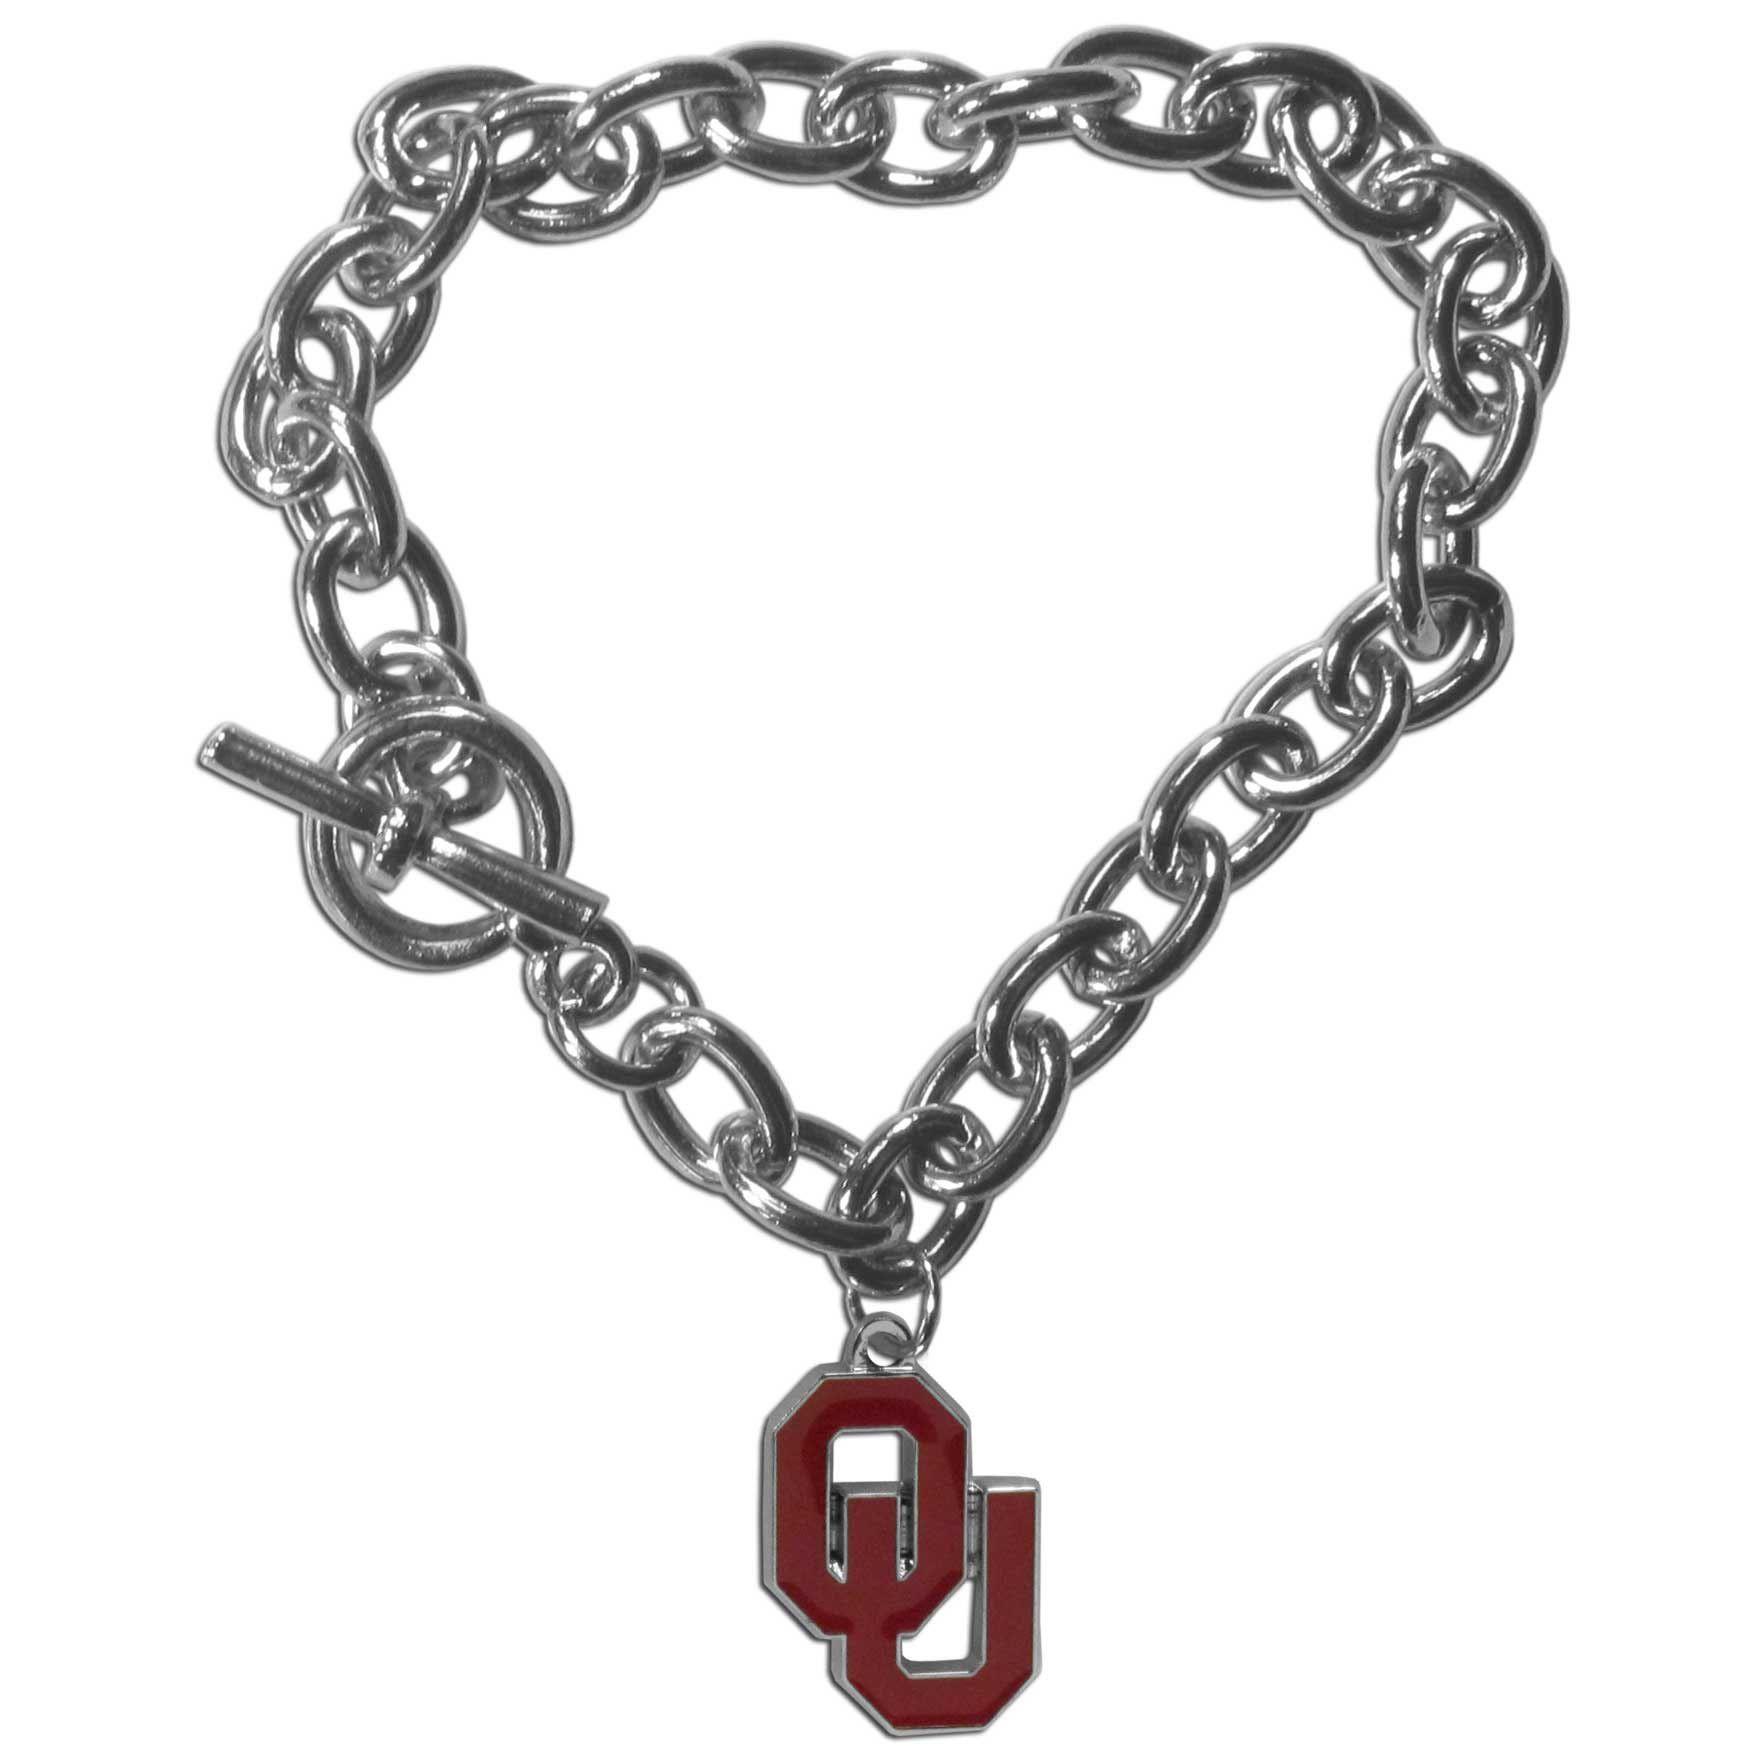 Oklahoma Sooners Charm Chain Bracelet